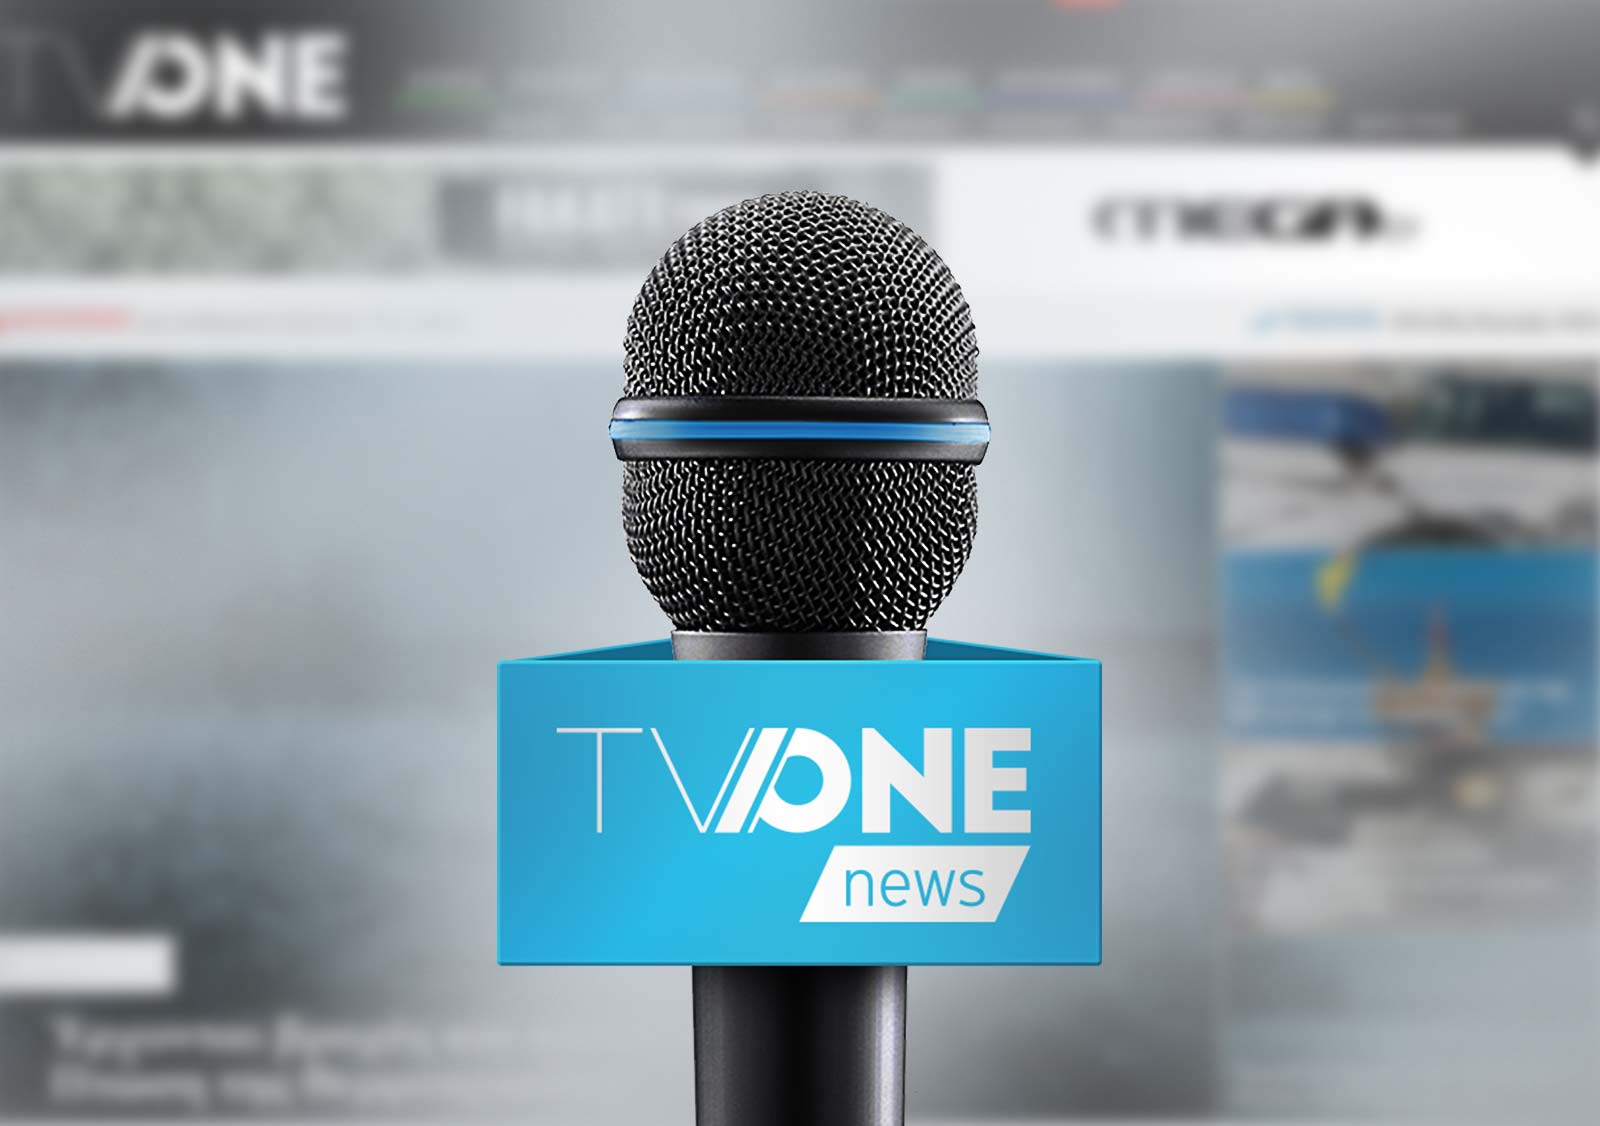 TVONE NEWS PORTAL